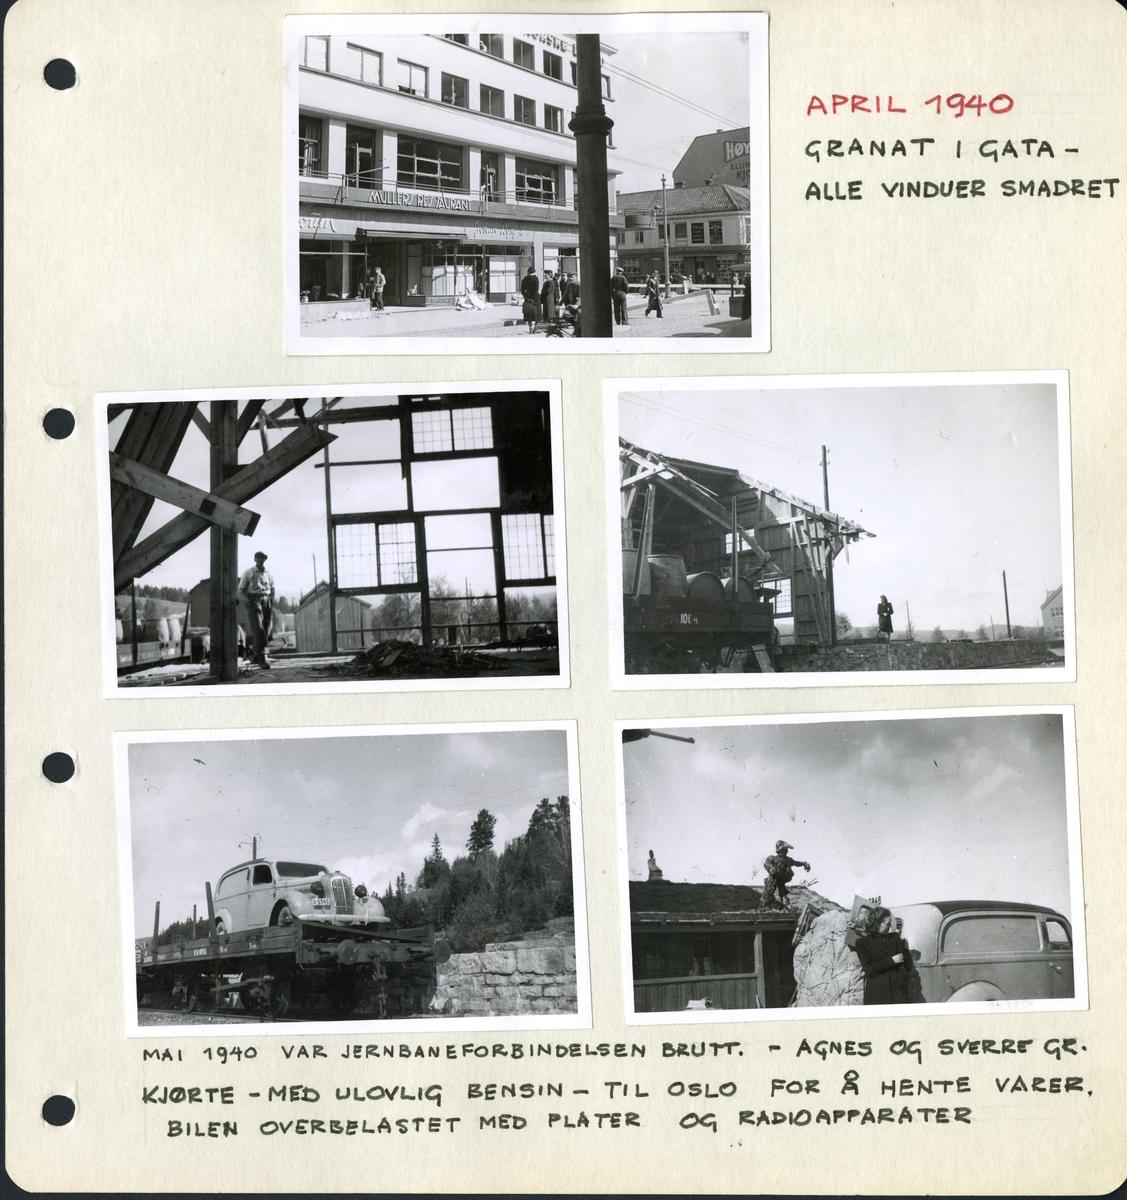 "Fra familiealbum. Under fotografiet står det: ""Fra april 1940. Granat i gata- alle vinduer smadret."""